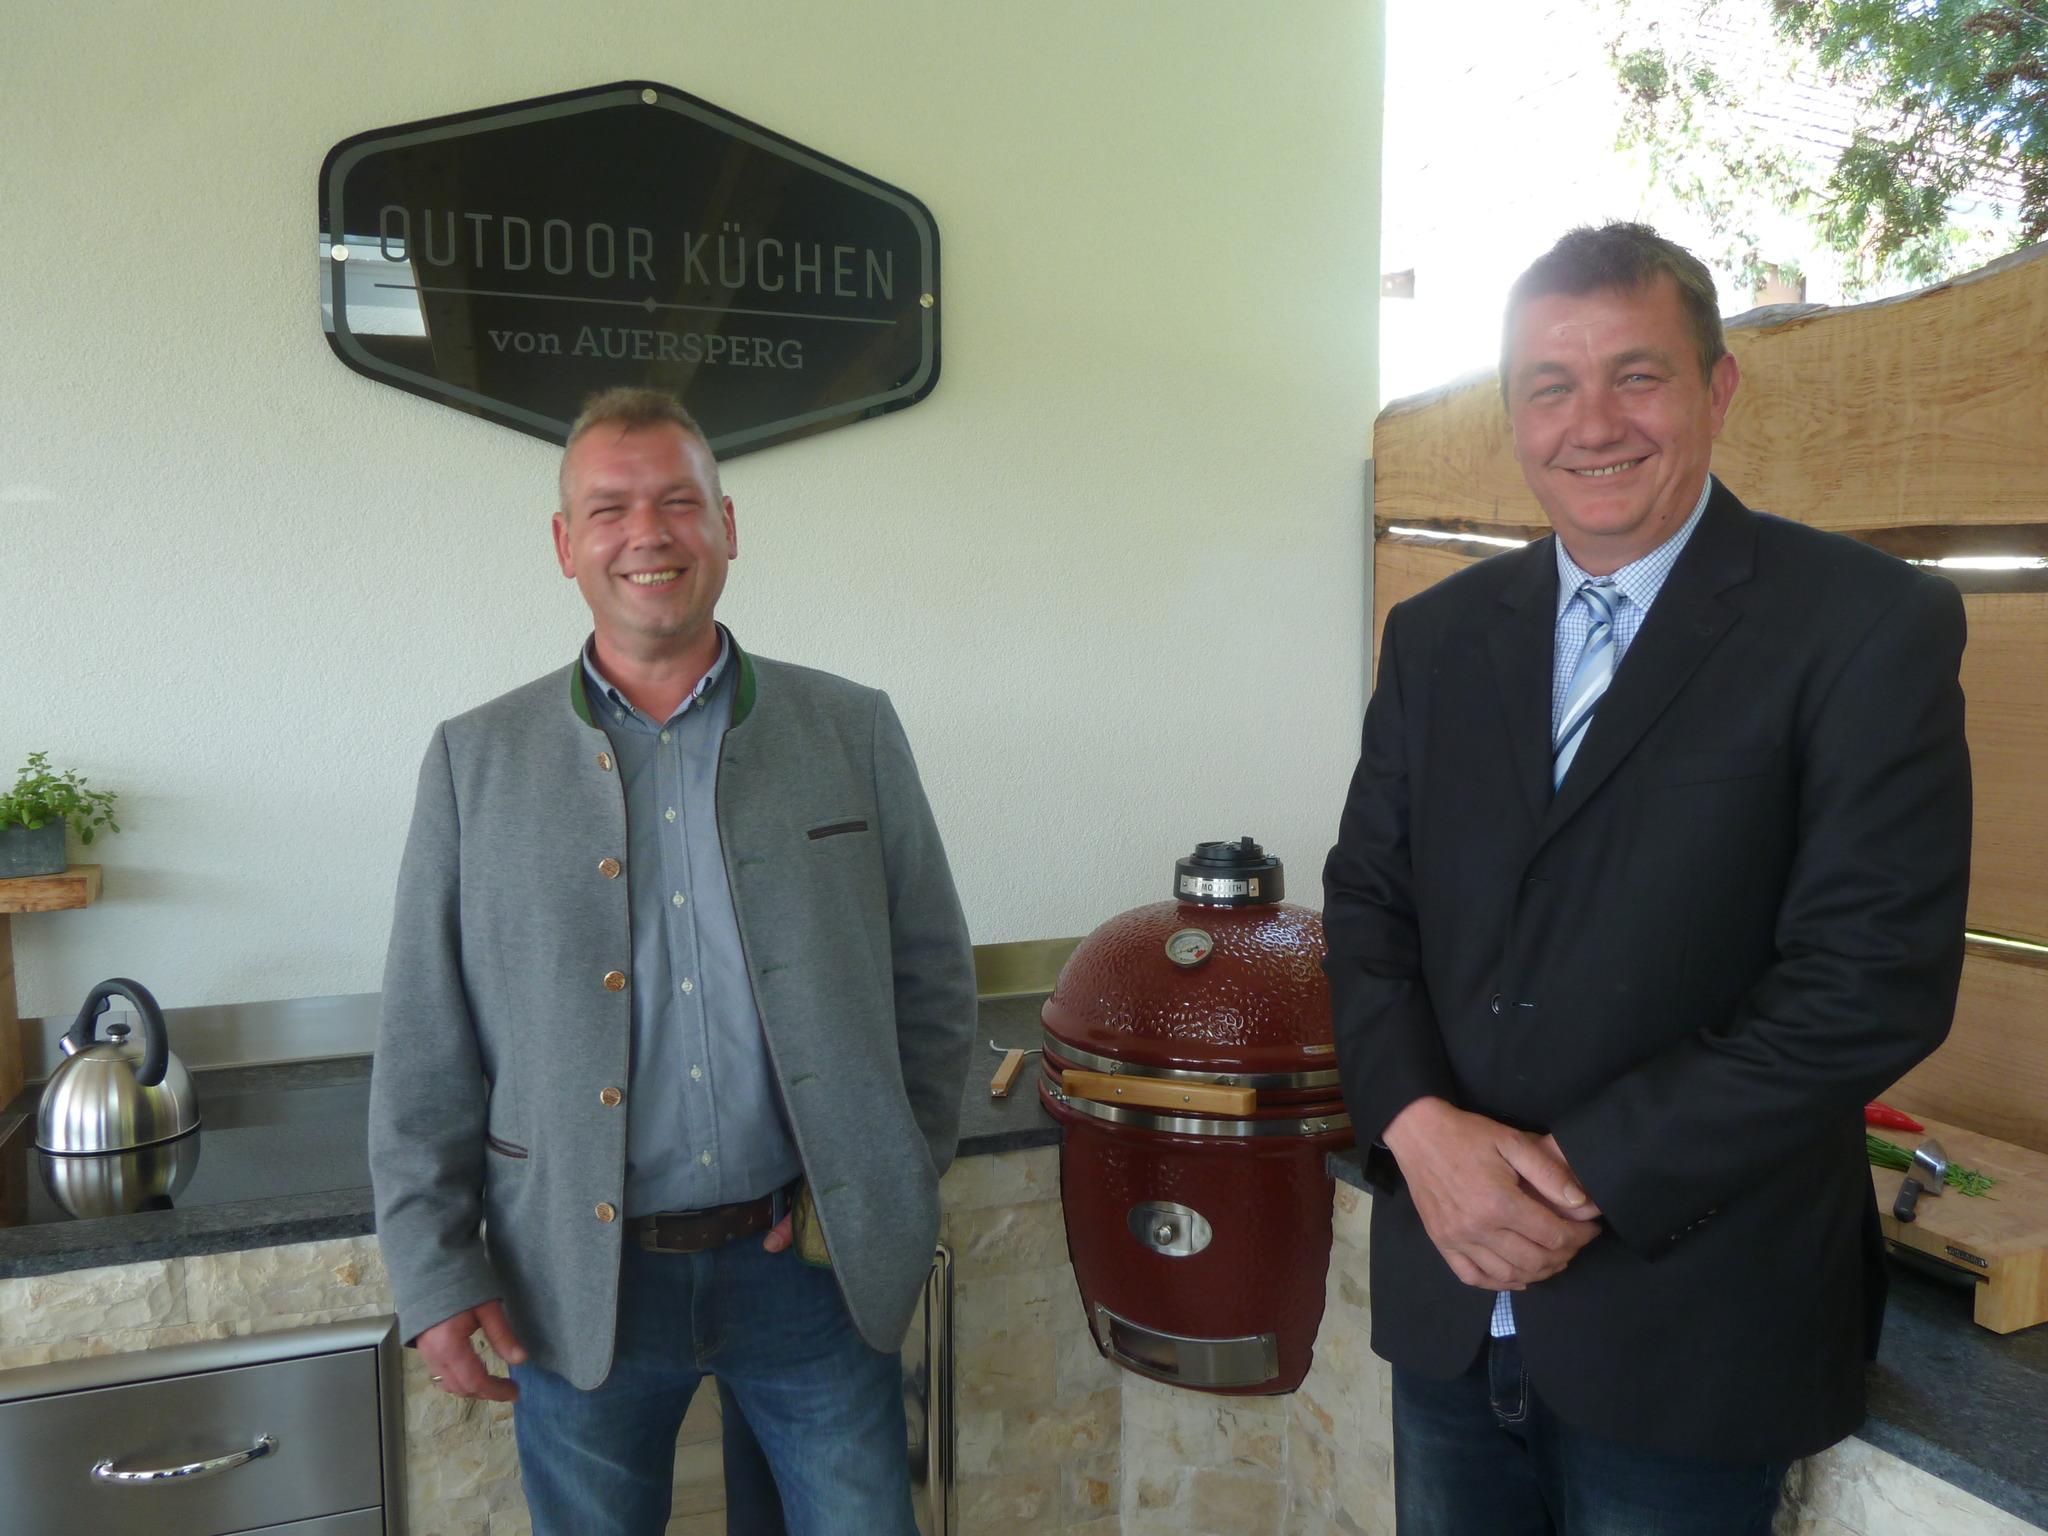 Outdoor Küche Xxl : Feuer flamme in draßburger outdoor küche mattersburg